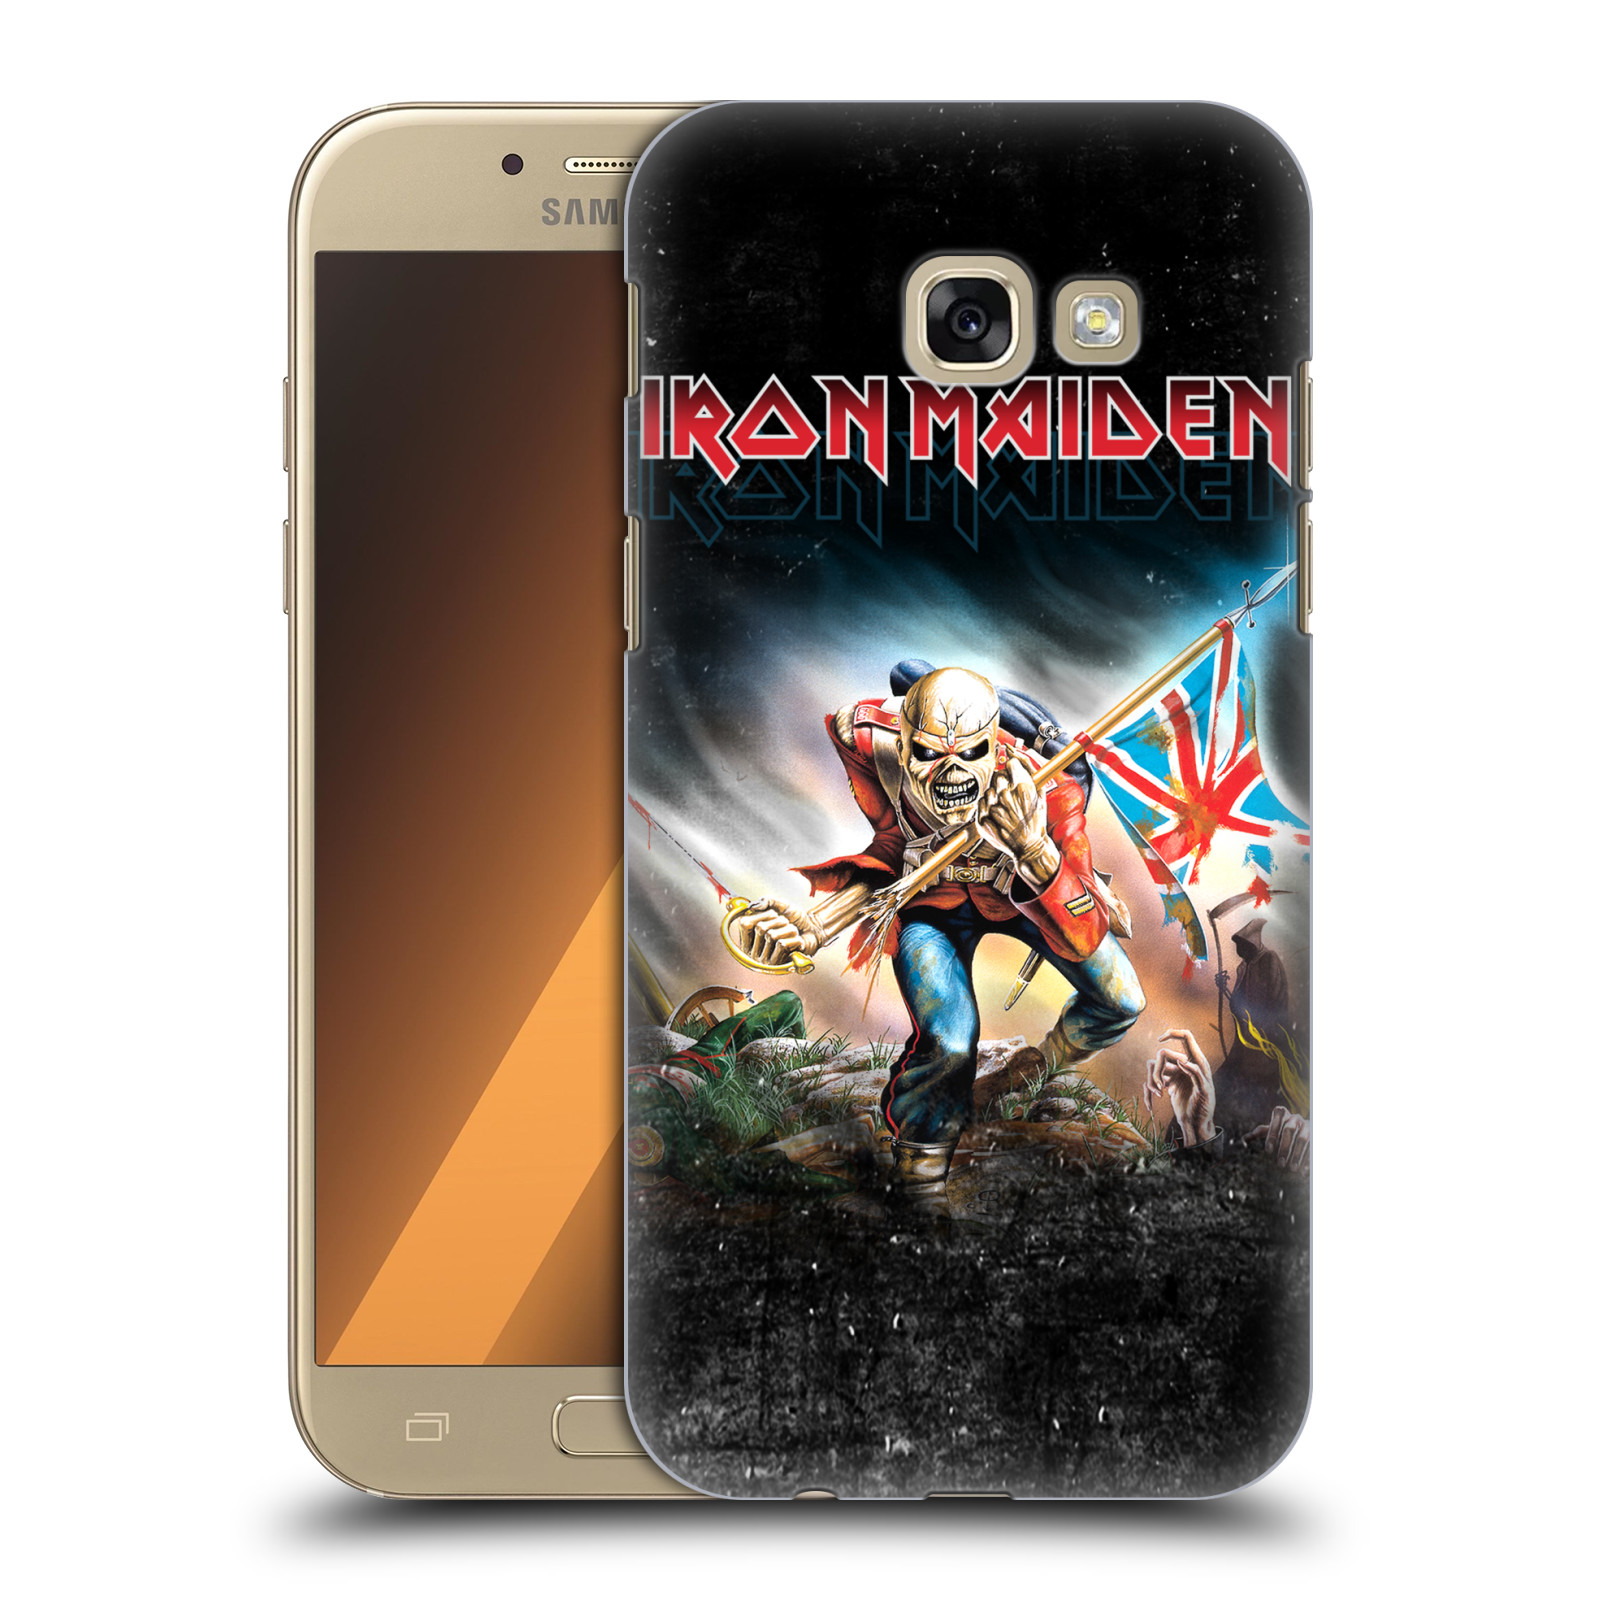 Plastové pouzdro na mobil Samsung Galaxy A5 (2017) HEAD CASE - Iron Maiden - Trooper 2016